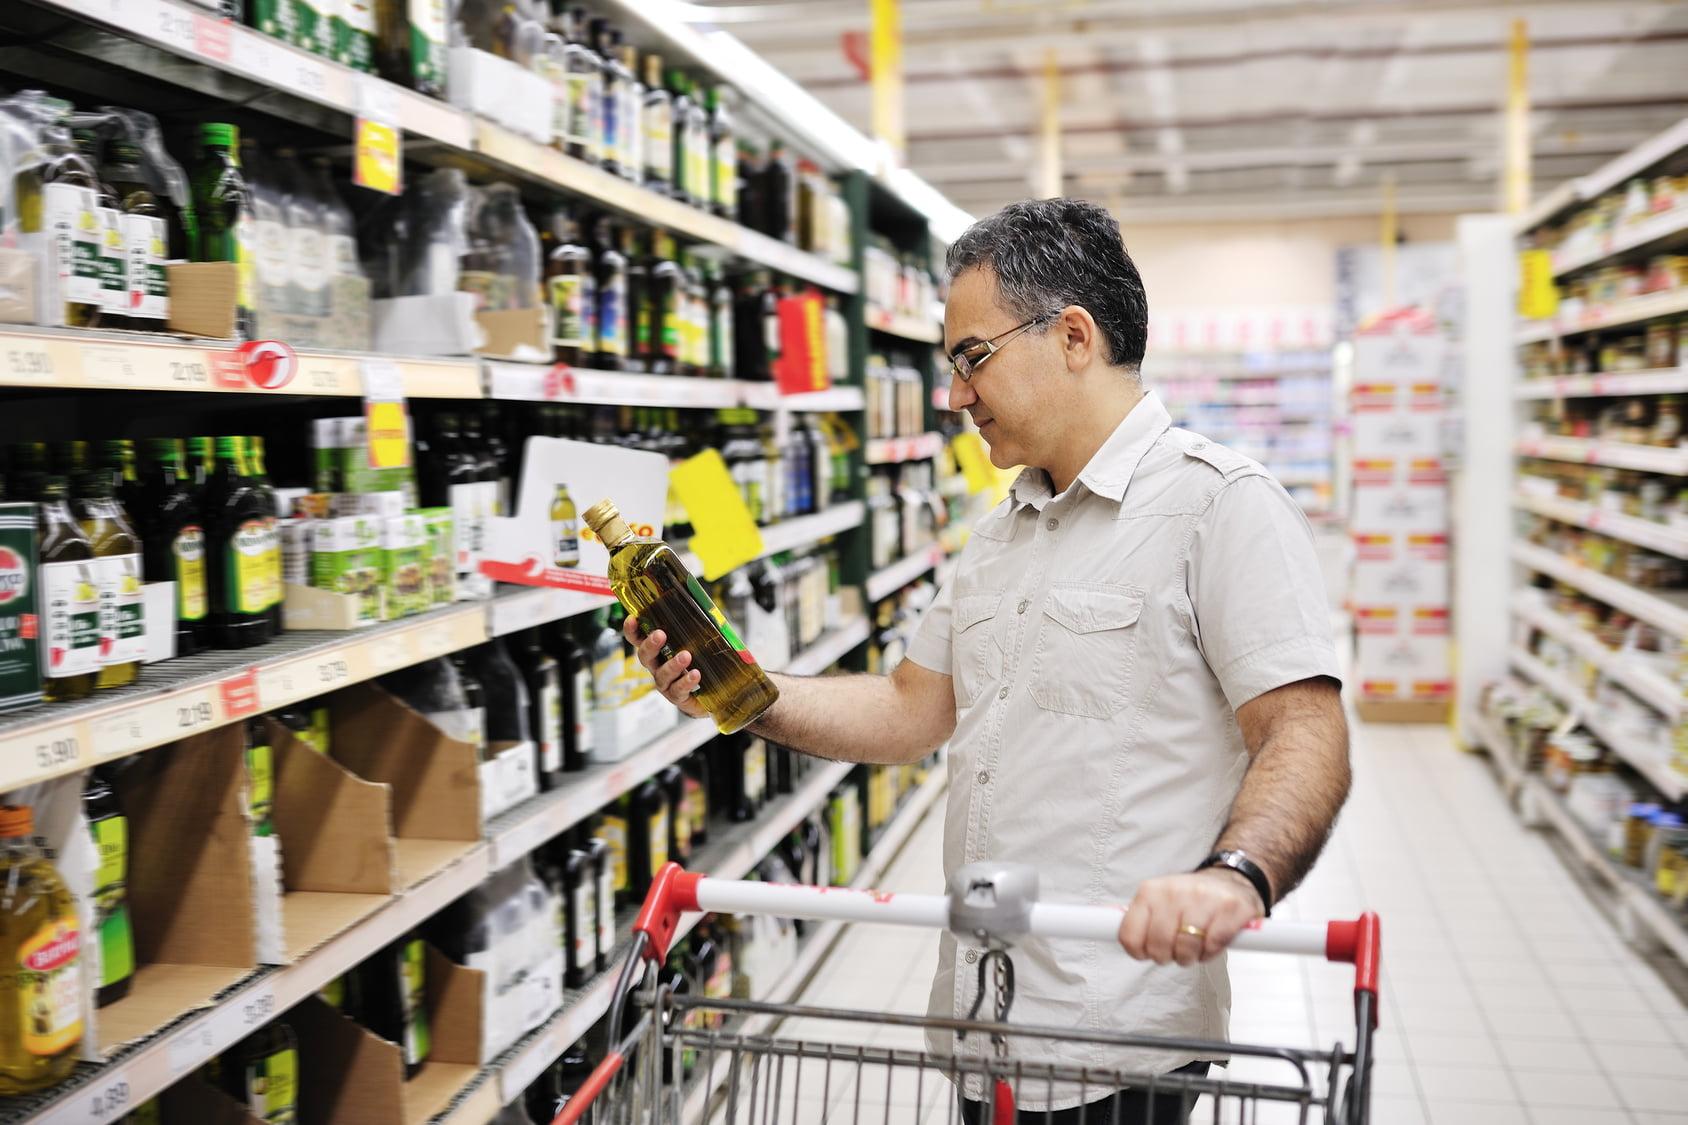 Por que comprar comida no atacado?